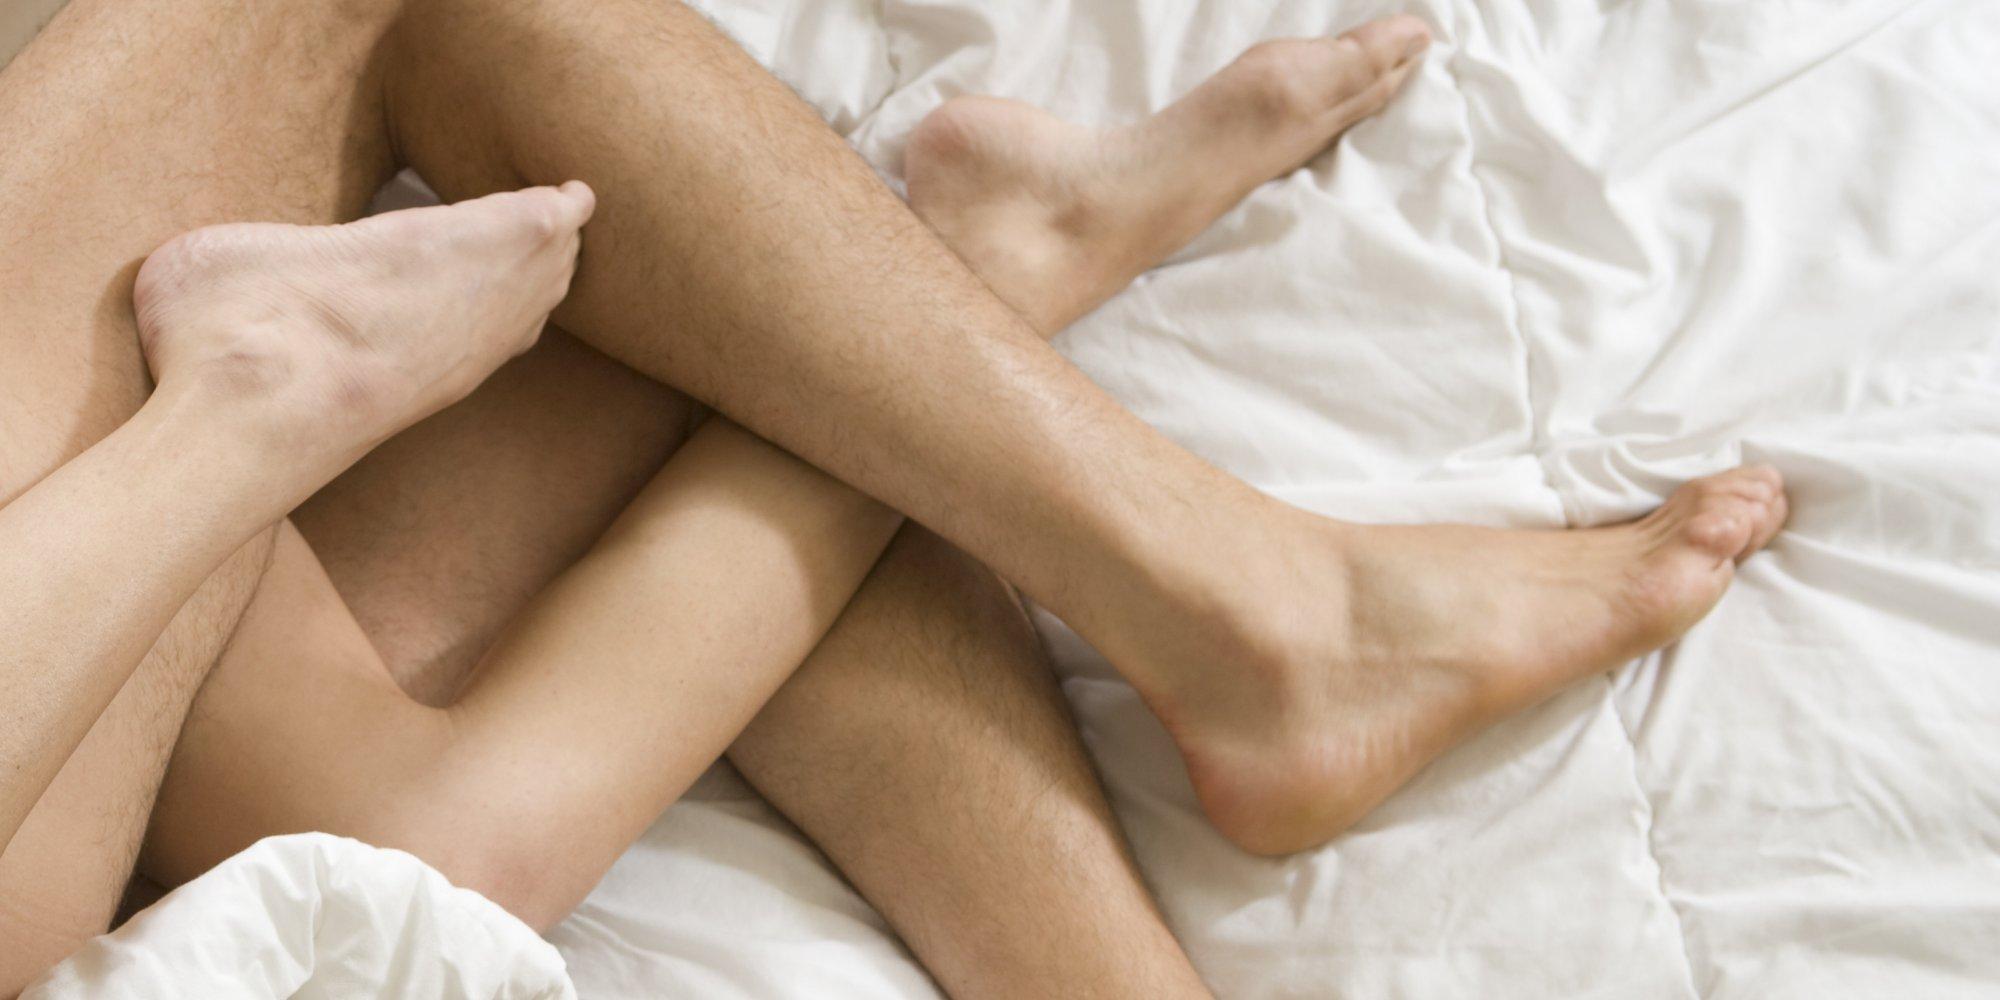 72Фото порно ноги на плечах